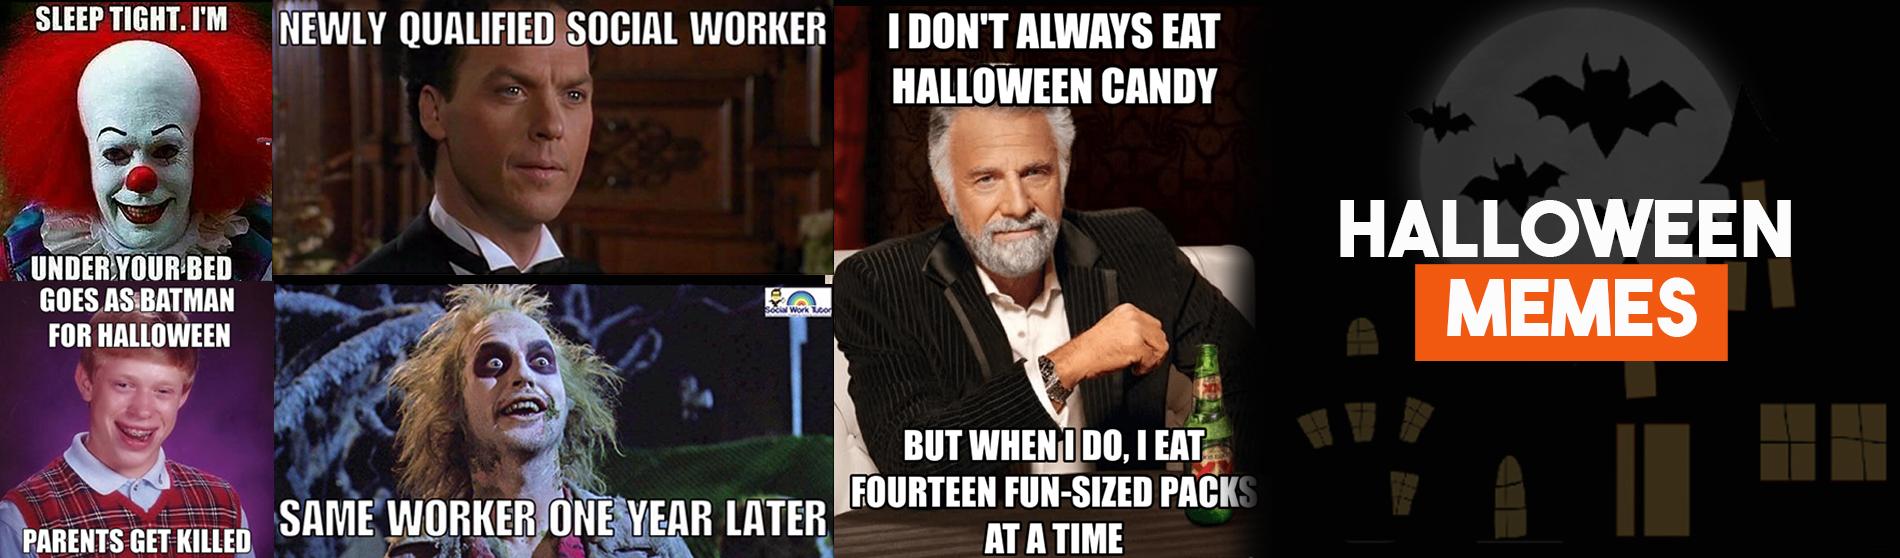 Halloween Memes, funny Halloween memes | GlendaleHalloween